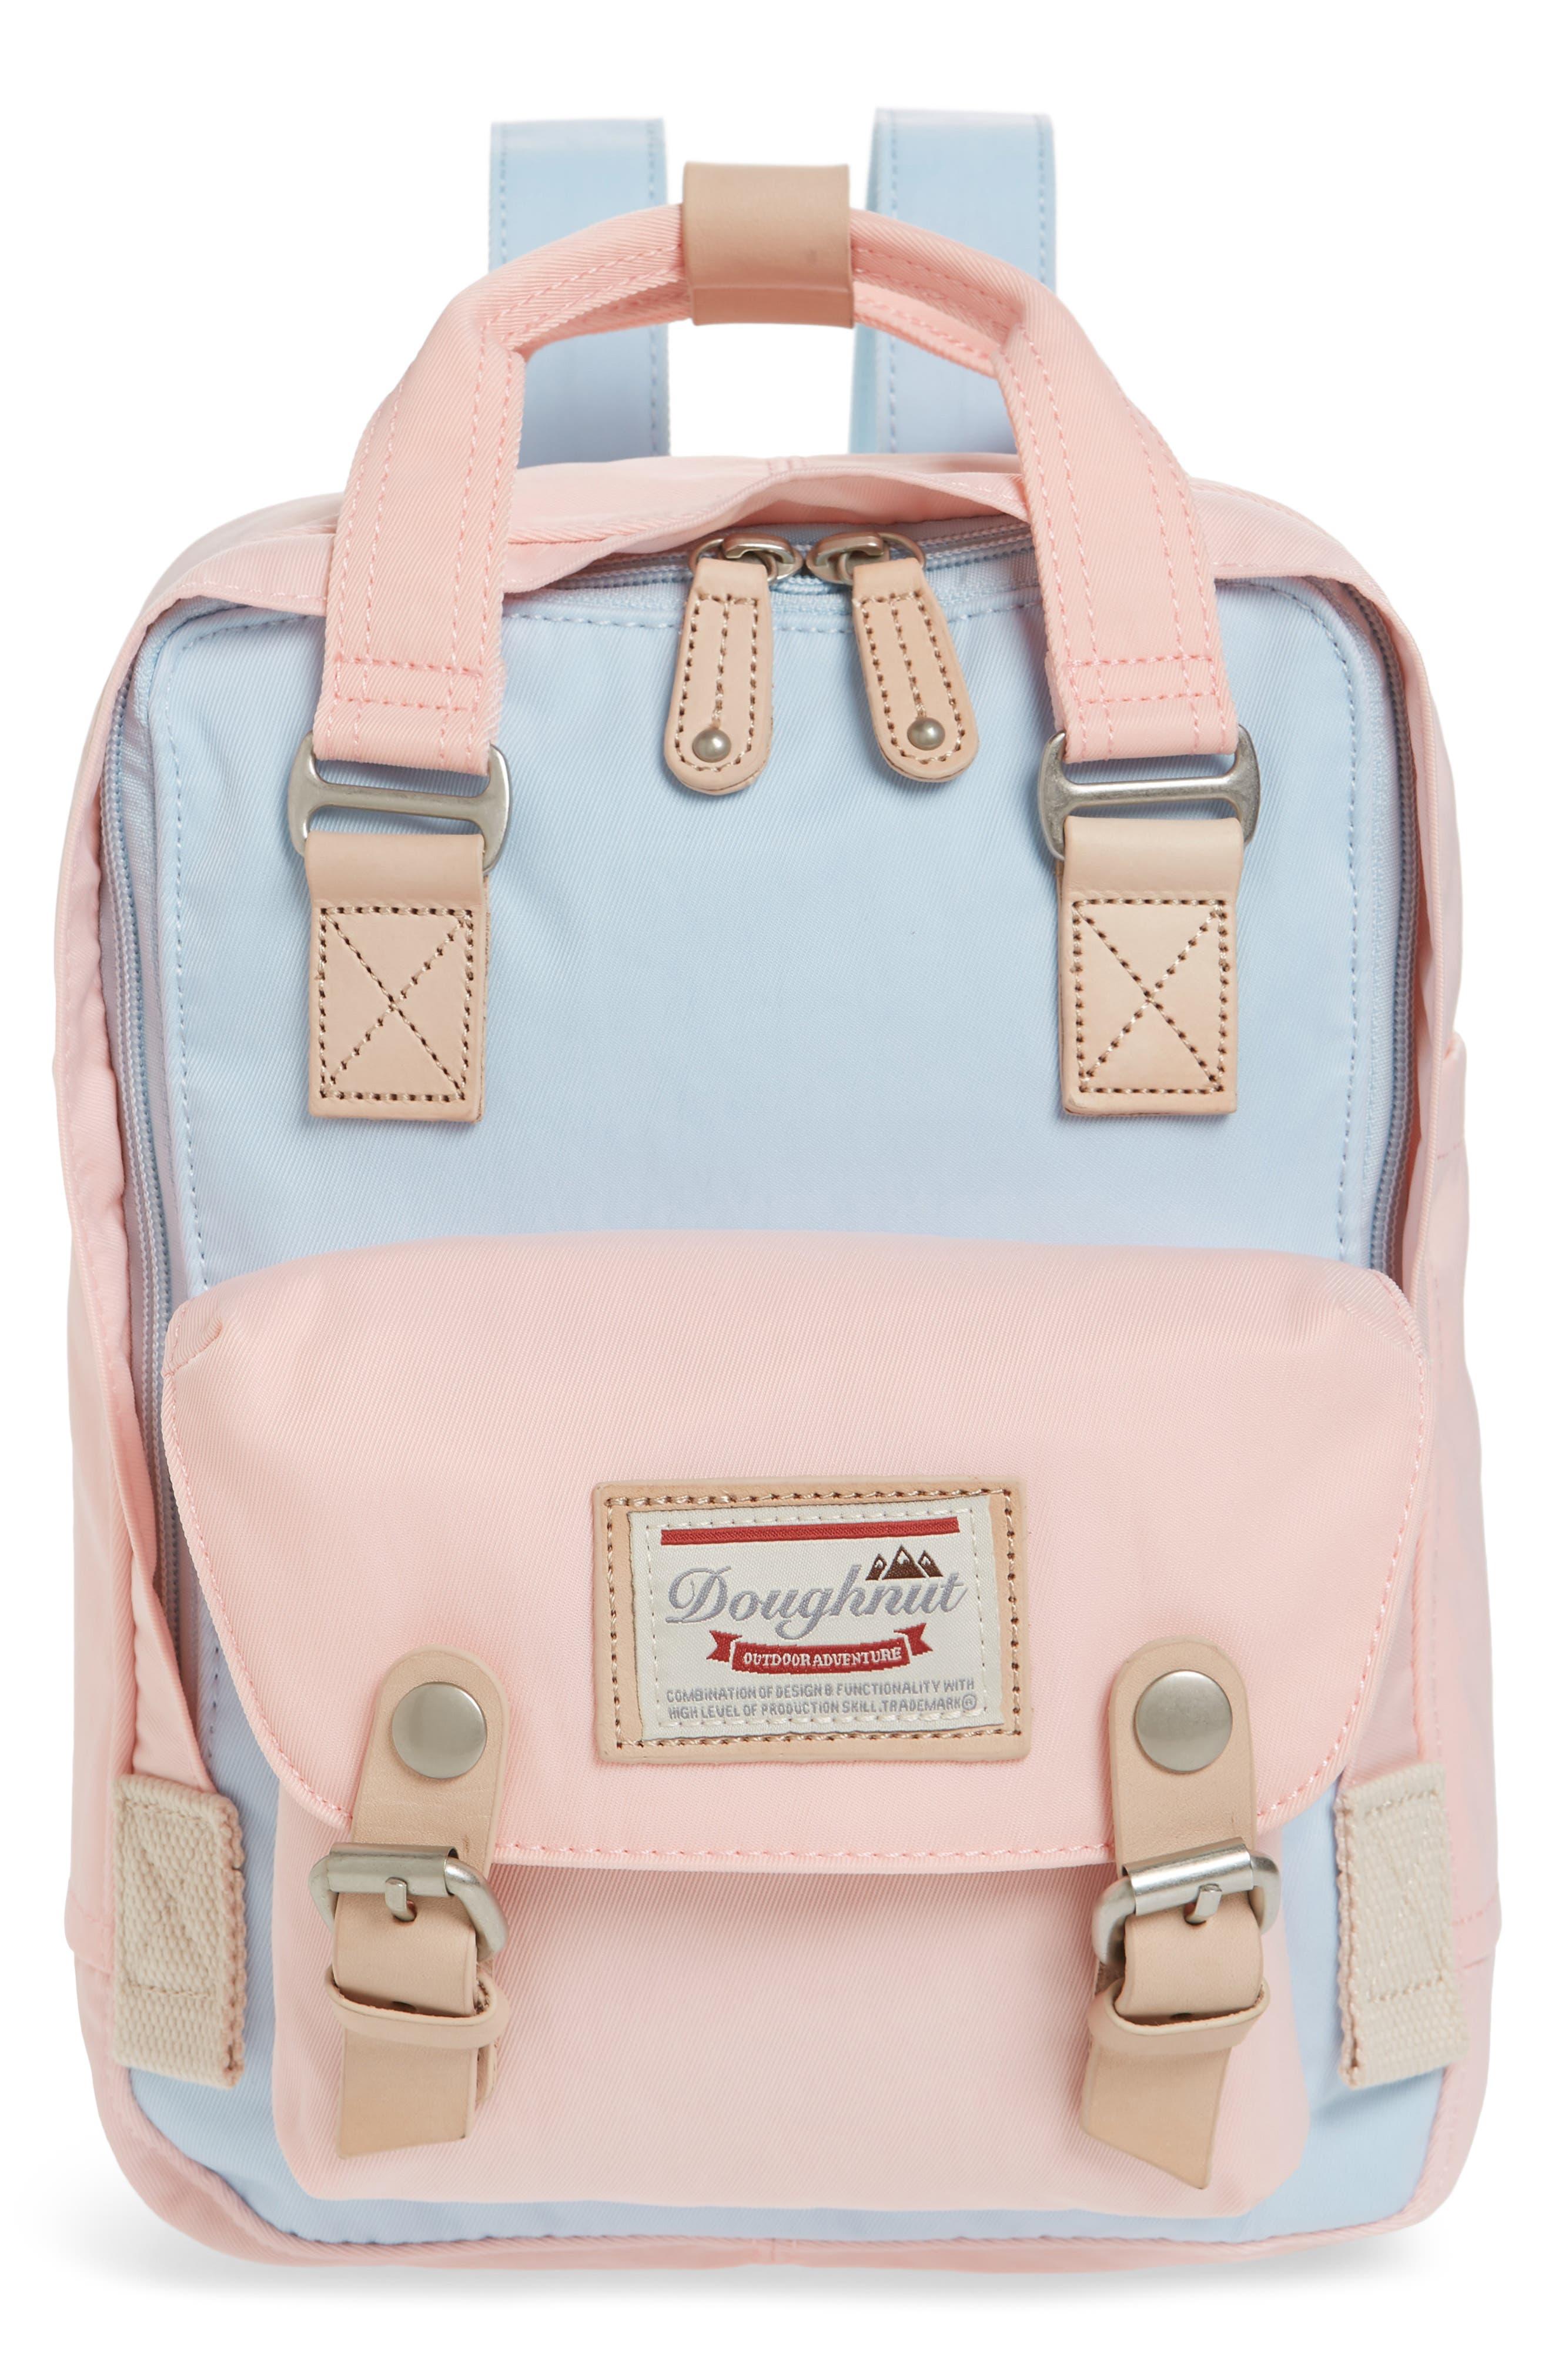 DOUGHNUT Mini Macaroon Colorblock Water Resistant Backpack - Blue in Iceberg/ Sakura